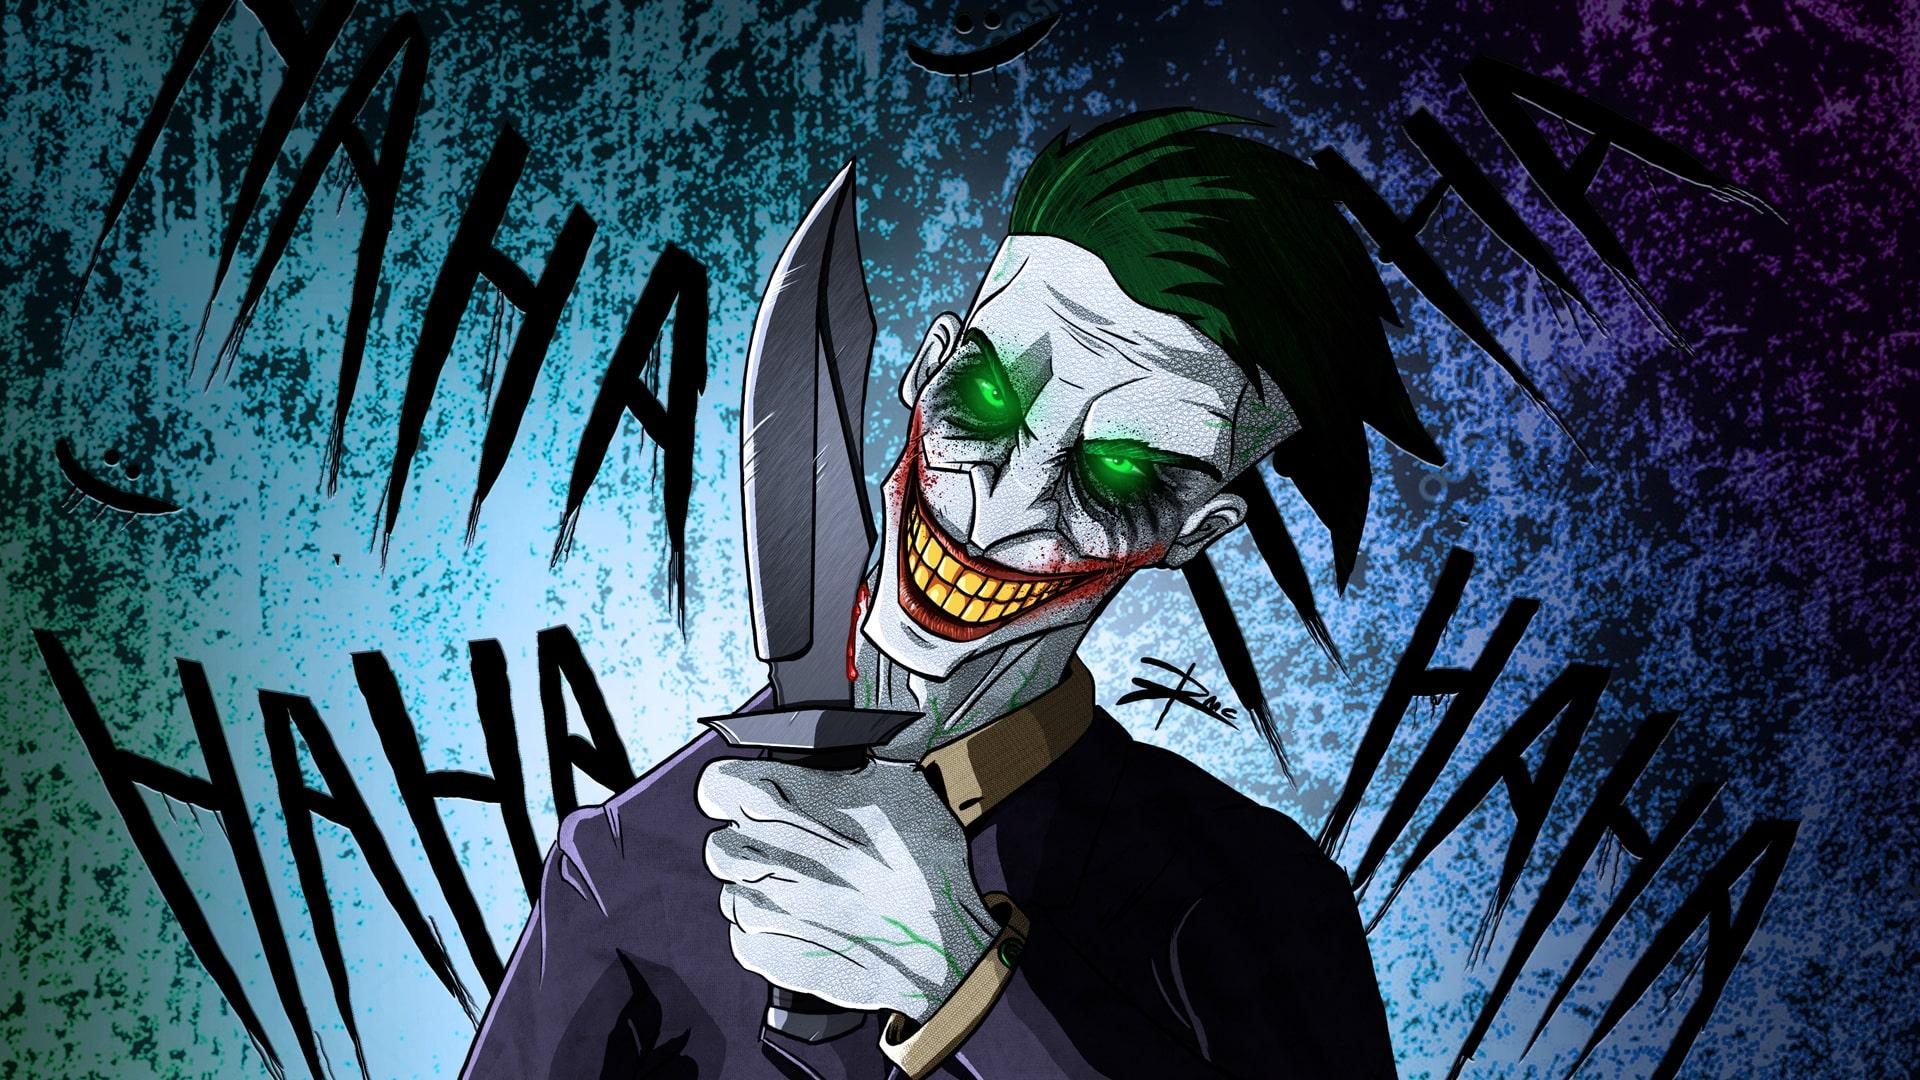 joker wallpaper, joker wallpaper 4k, joke art wallpaper